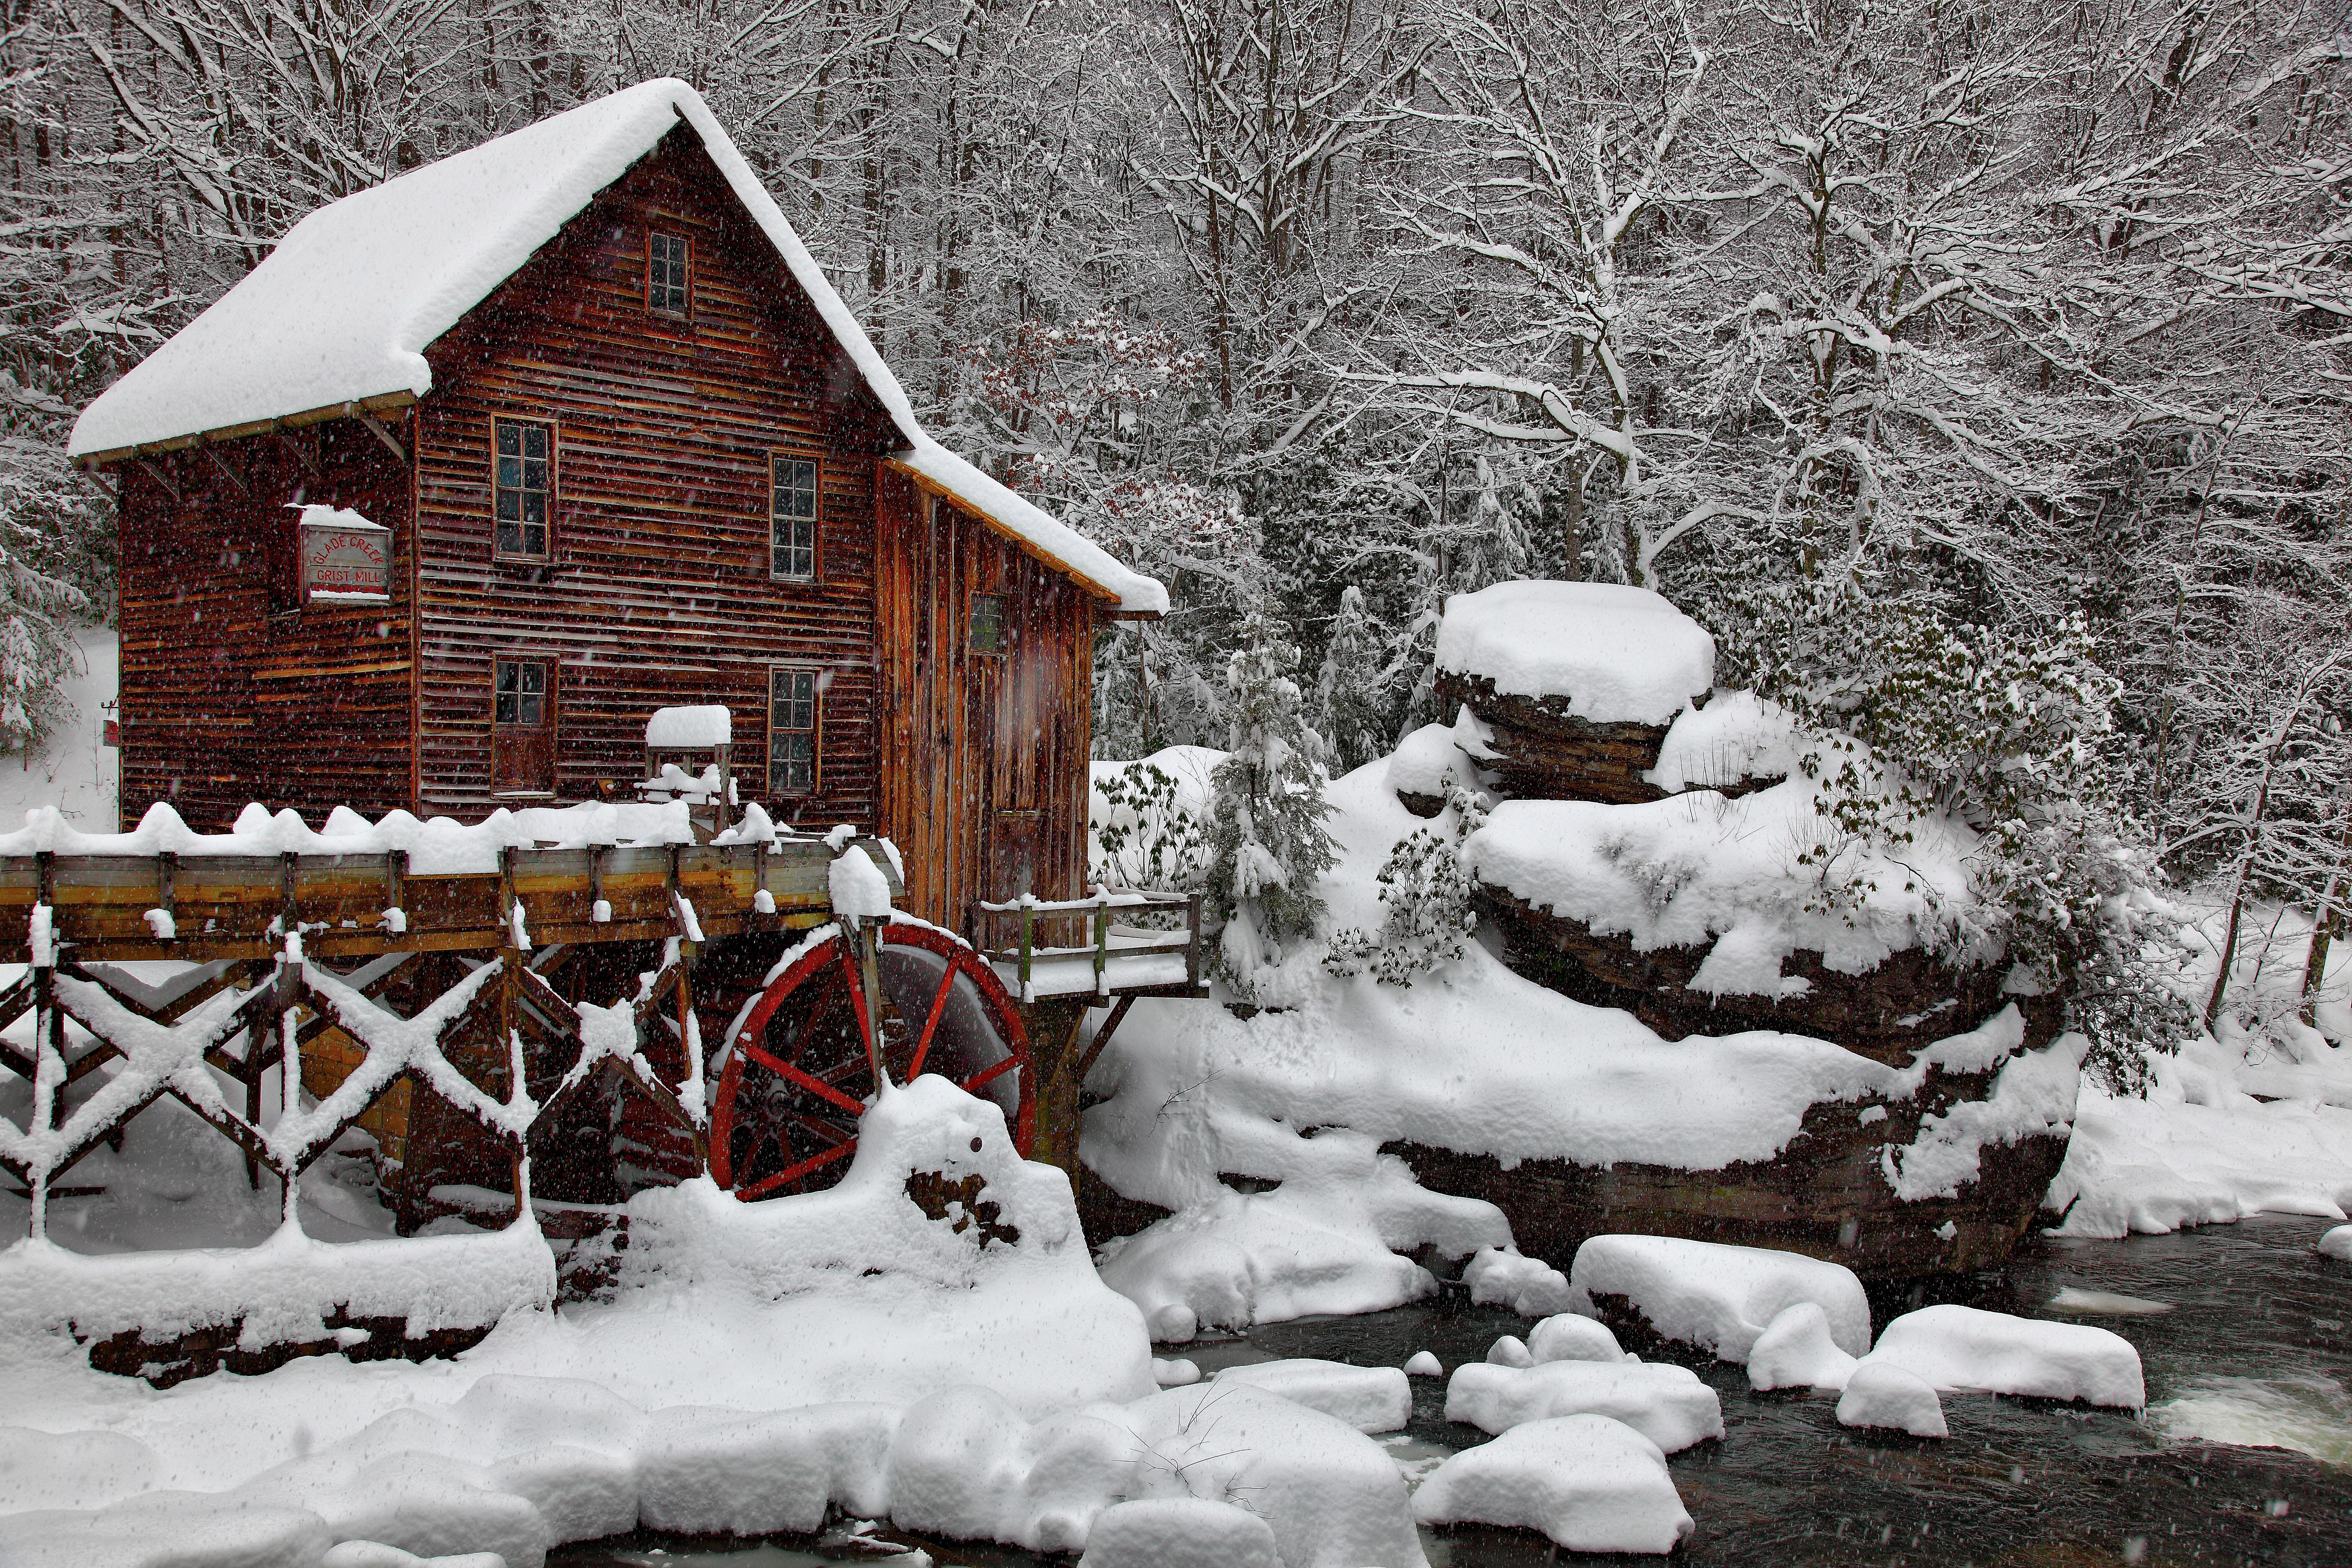 Winter Snow Falling Scenes